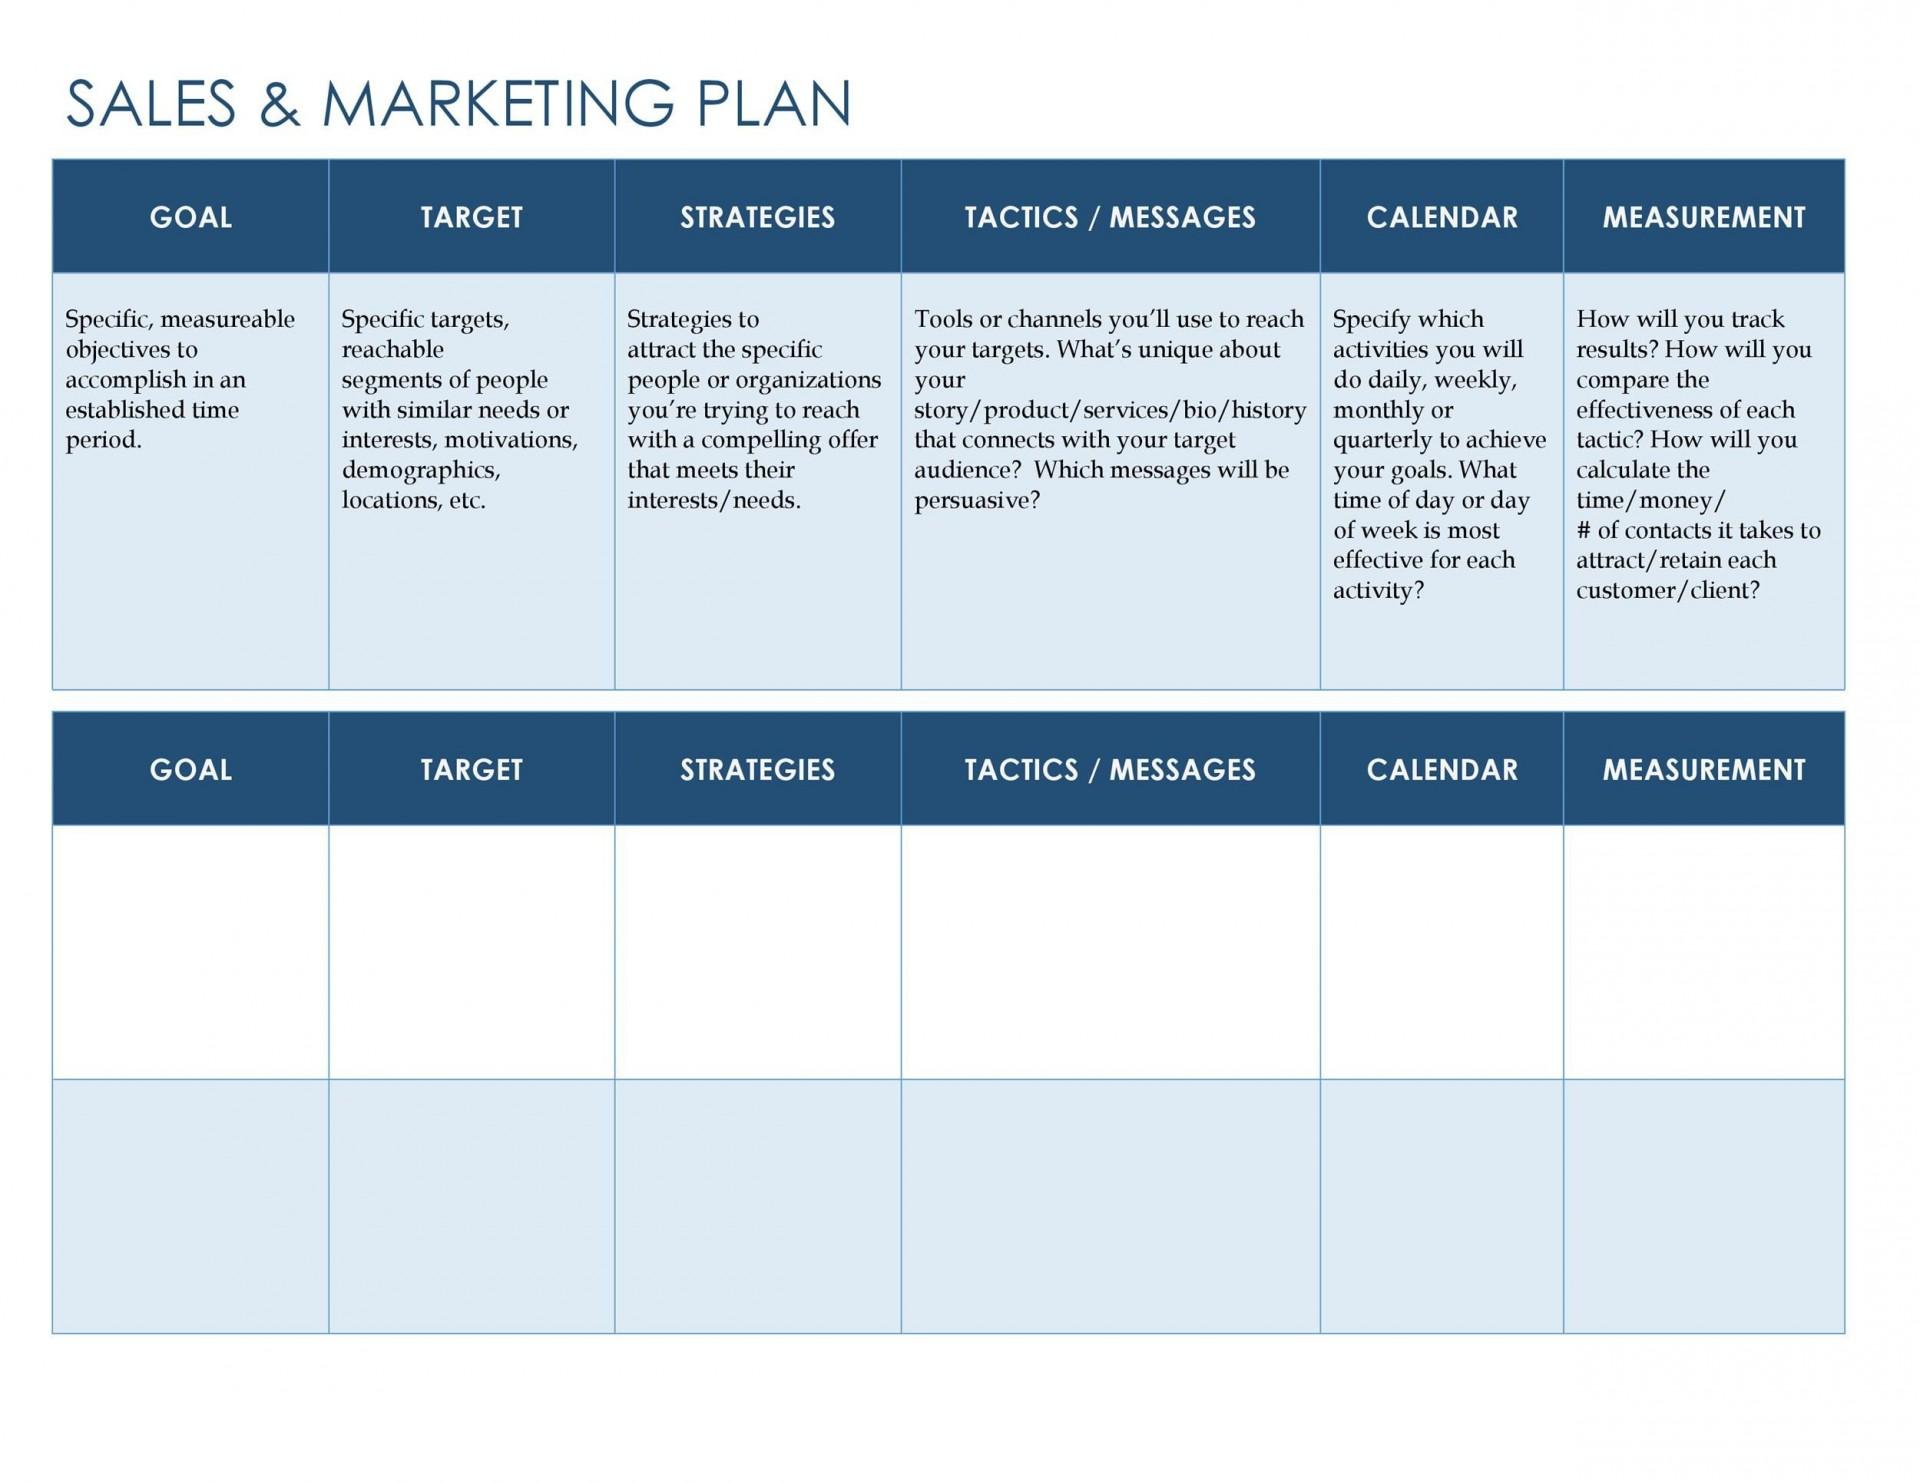 007 Frightening Personal Development Plan Template Excel Sample 1920